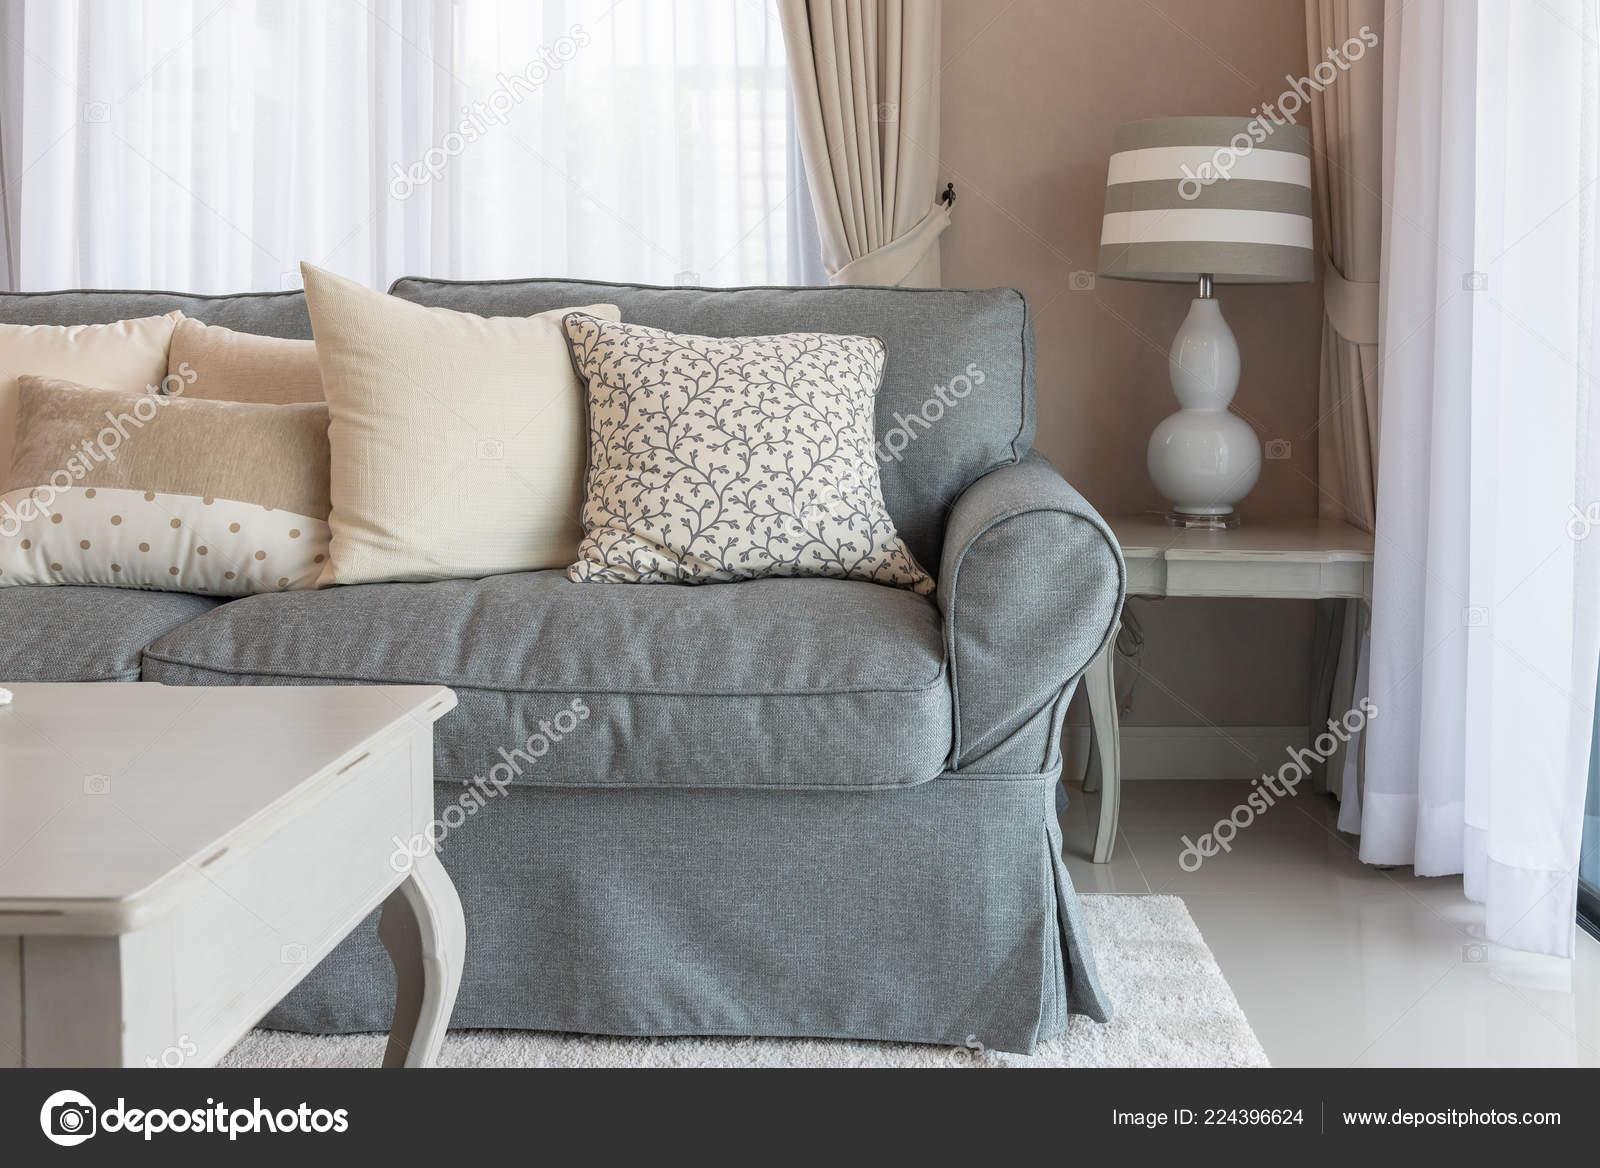 Klassieke woonkamer stijl met elegantie sofa set van kussens